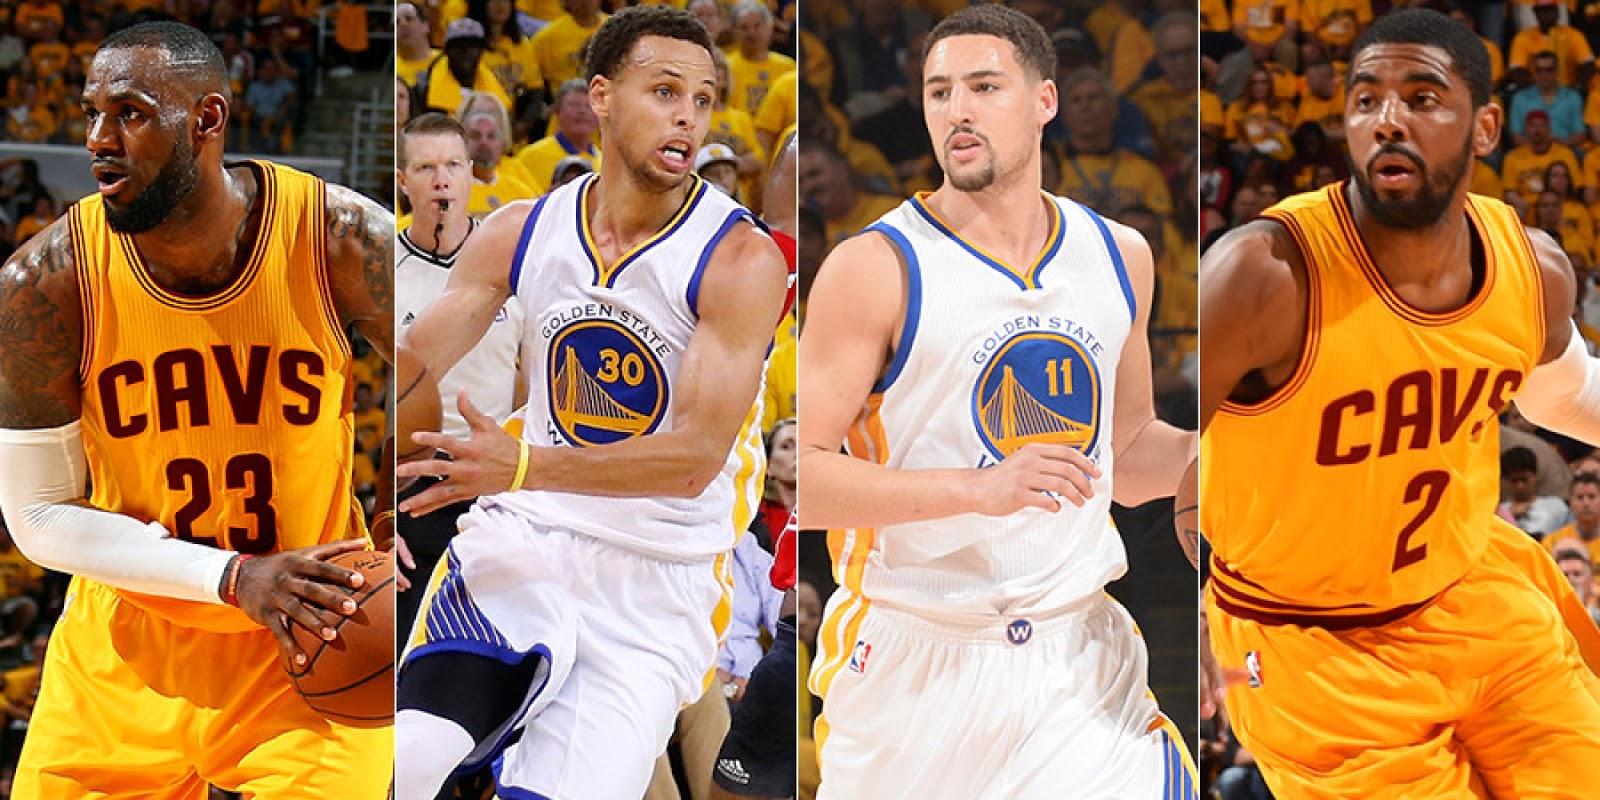 ViralPenguin: Cleveland Cavaliers vs Golden State Warriors ...